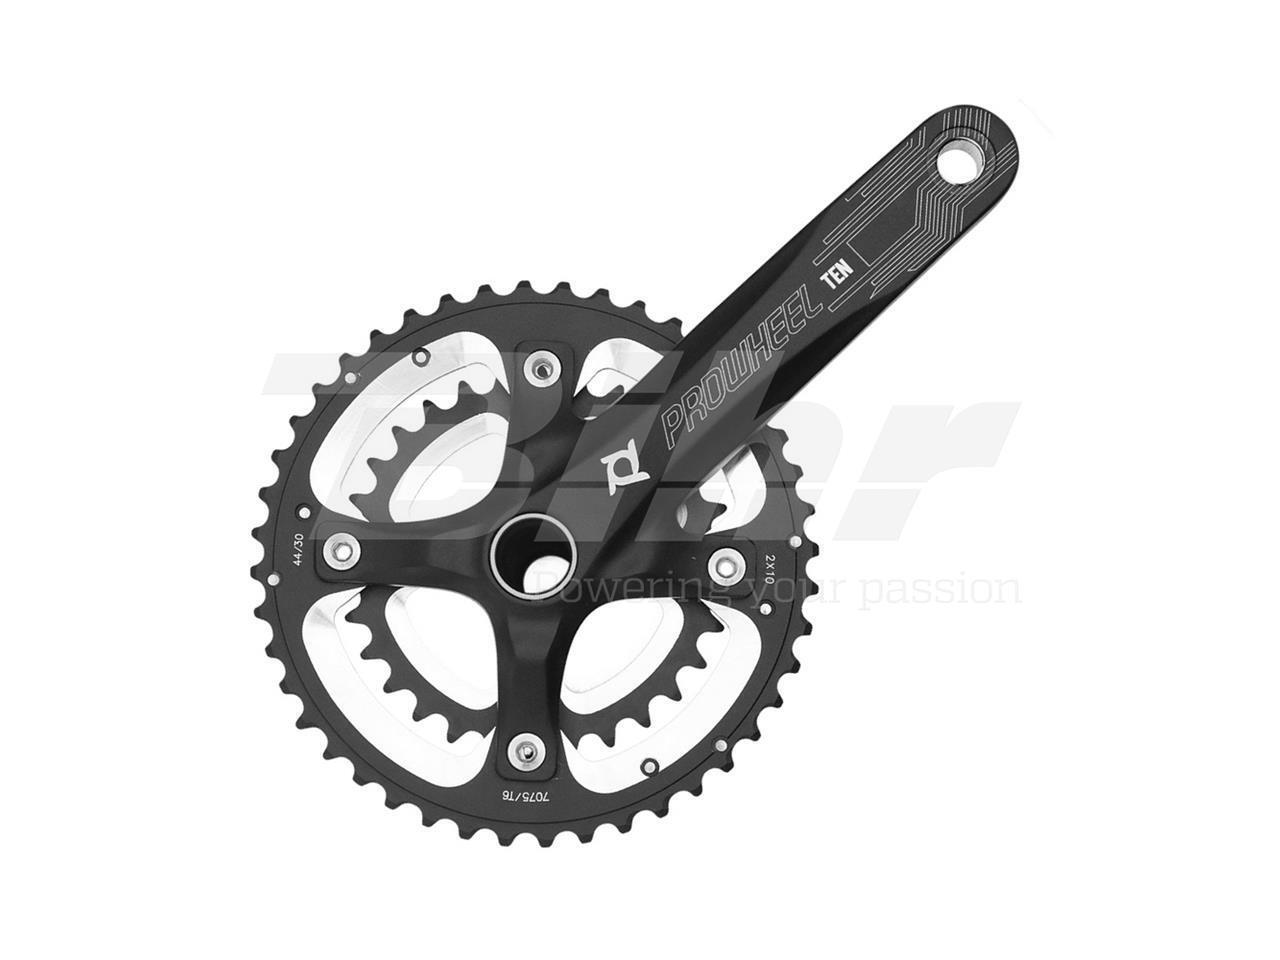 CRANKSET CHAINRING 15402 PROWHEEL 40 28 CRANK ARM 175 MM BIKE MTB BICYCLE